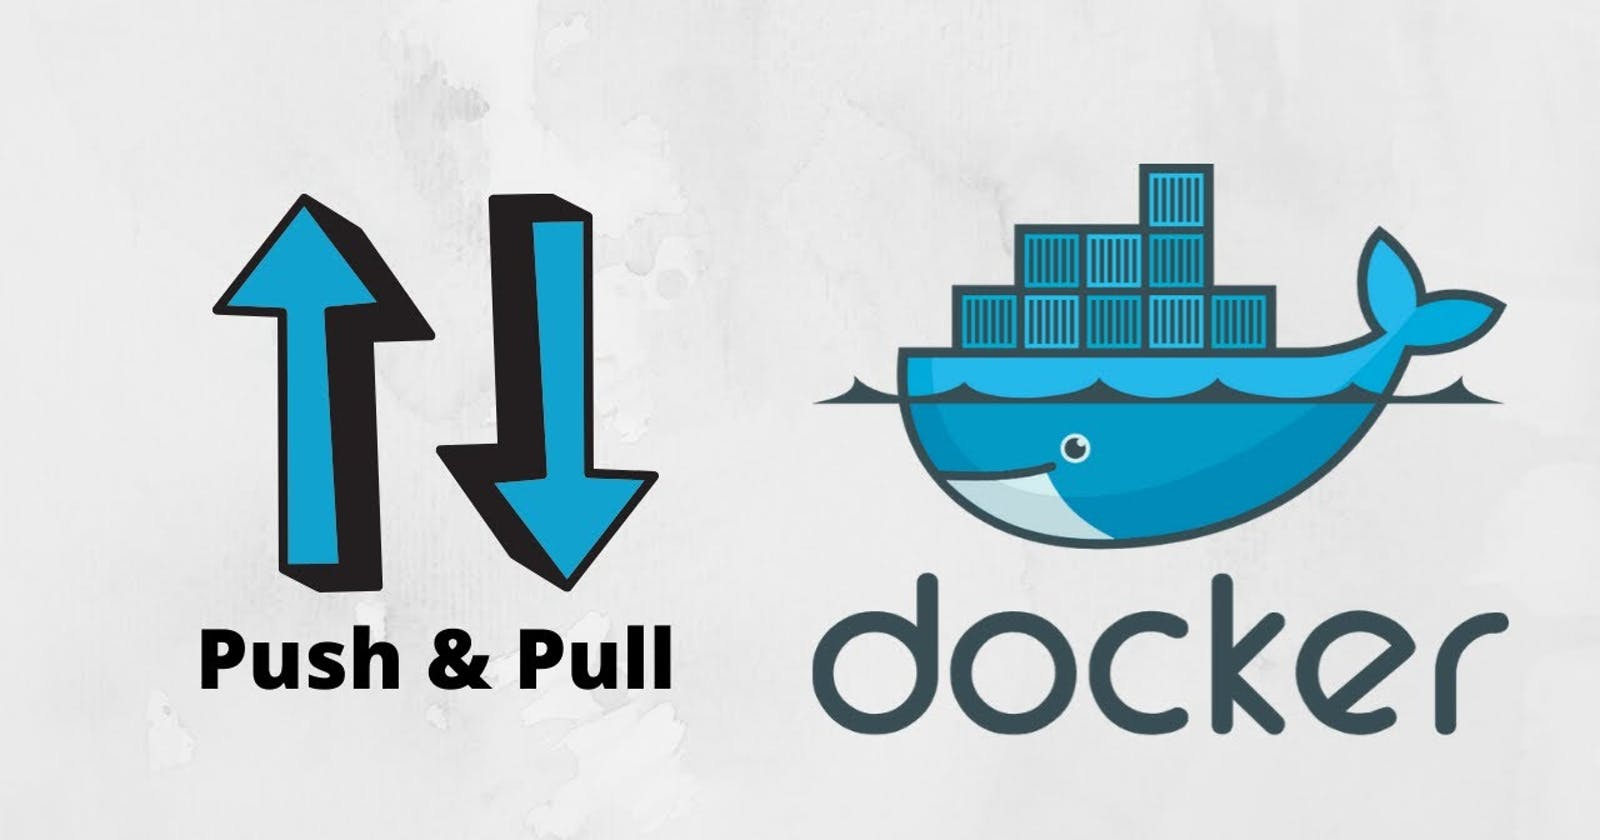 Getting familiar with Docker